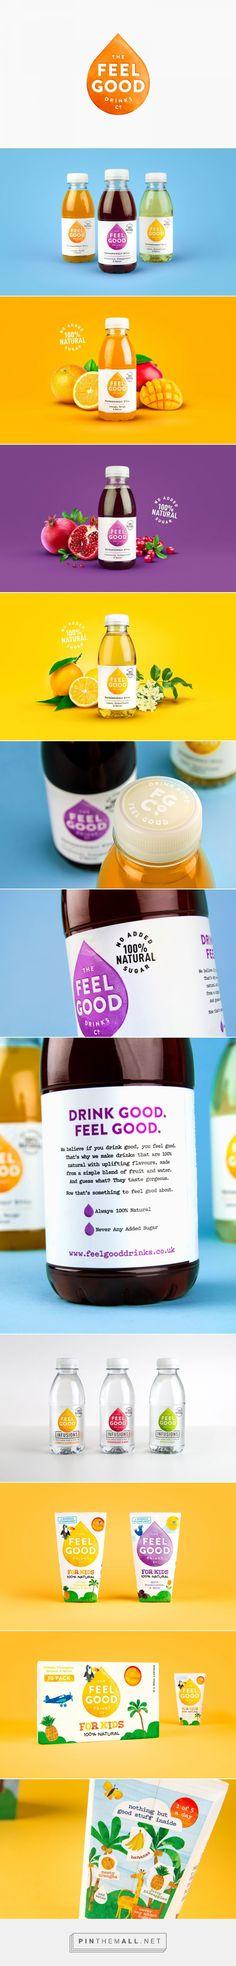 Feel Good drinks packaging design by Robot Food - http://www.packagingoftheworld.com/2017/10/feel-good.html